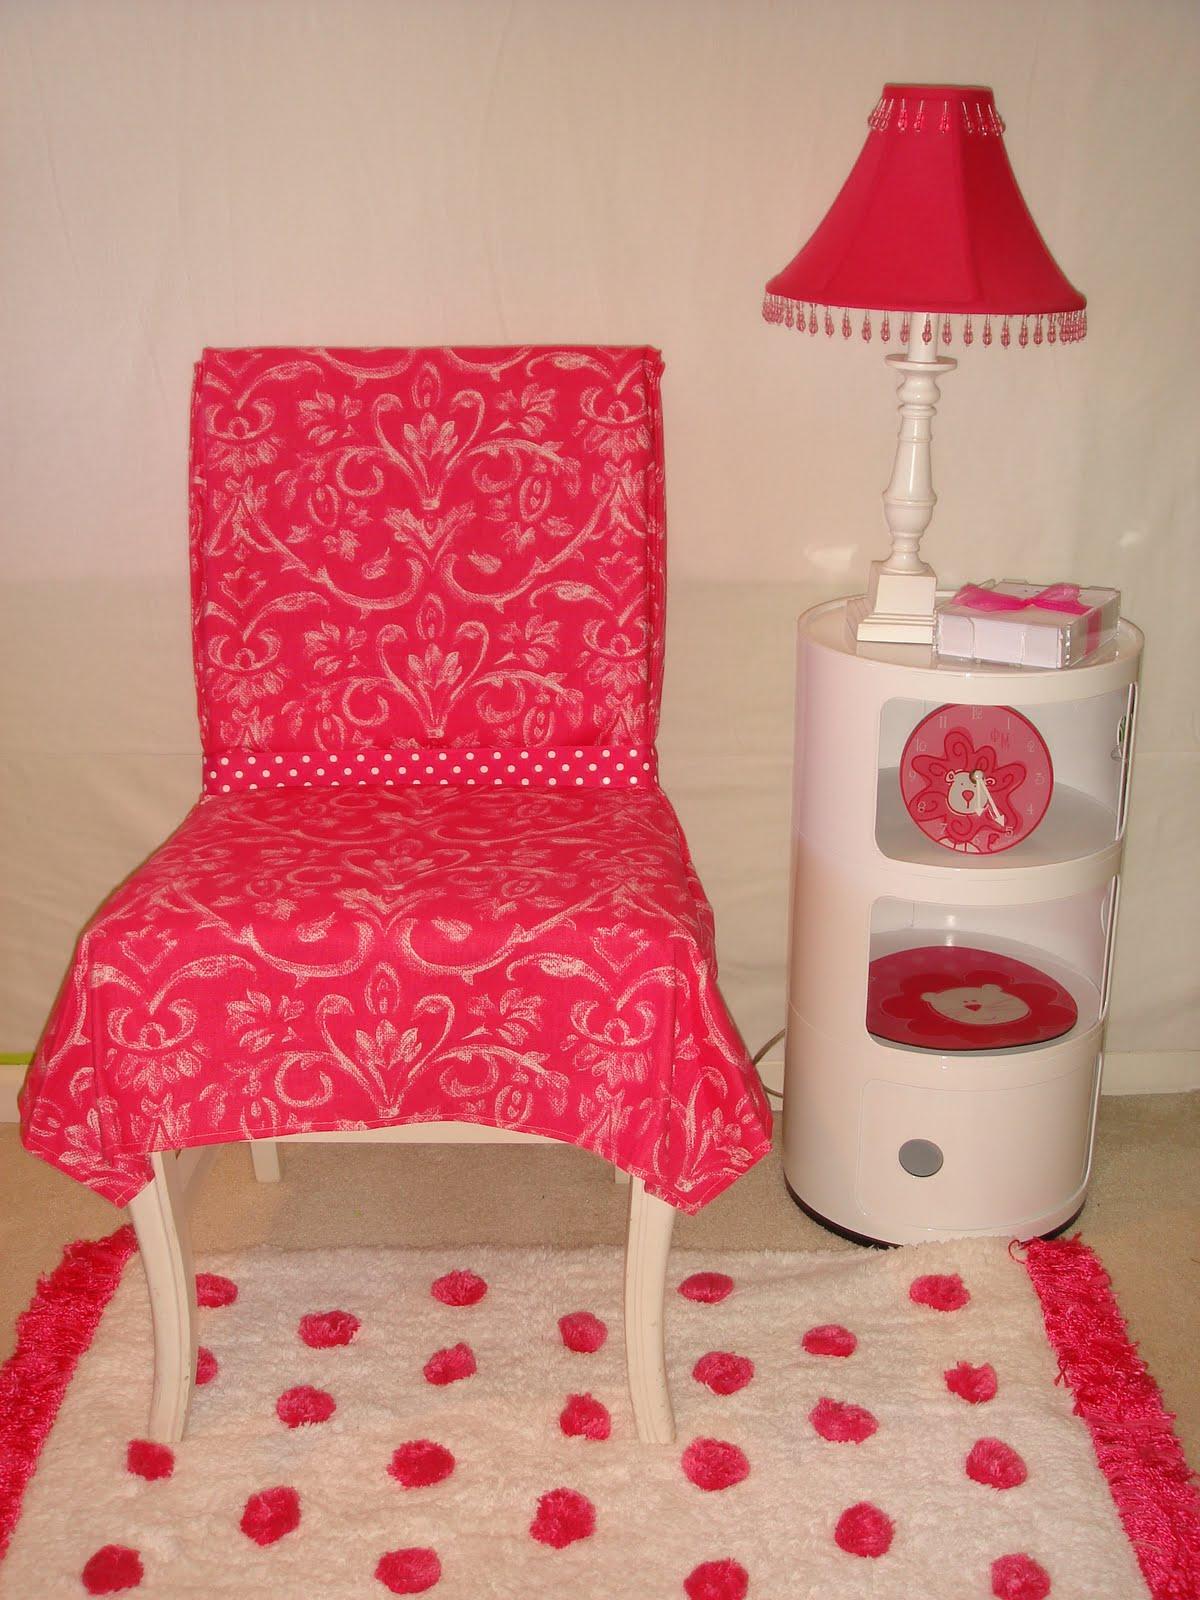 Decor 2 Ur Door Chair Slipcovers For Dorm Desk Chairs